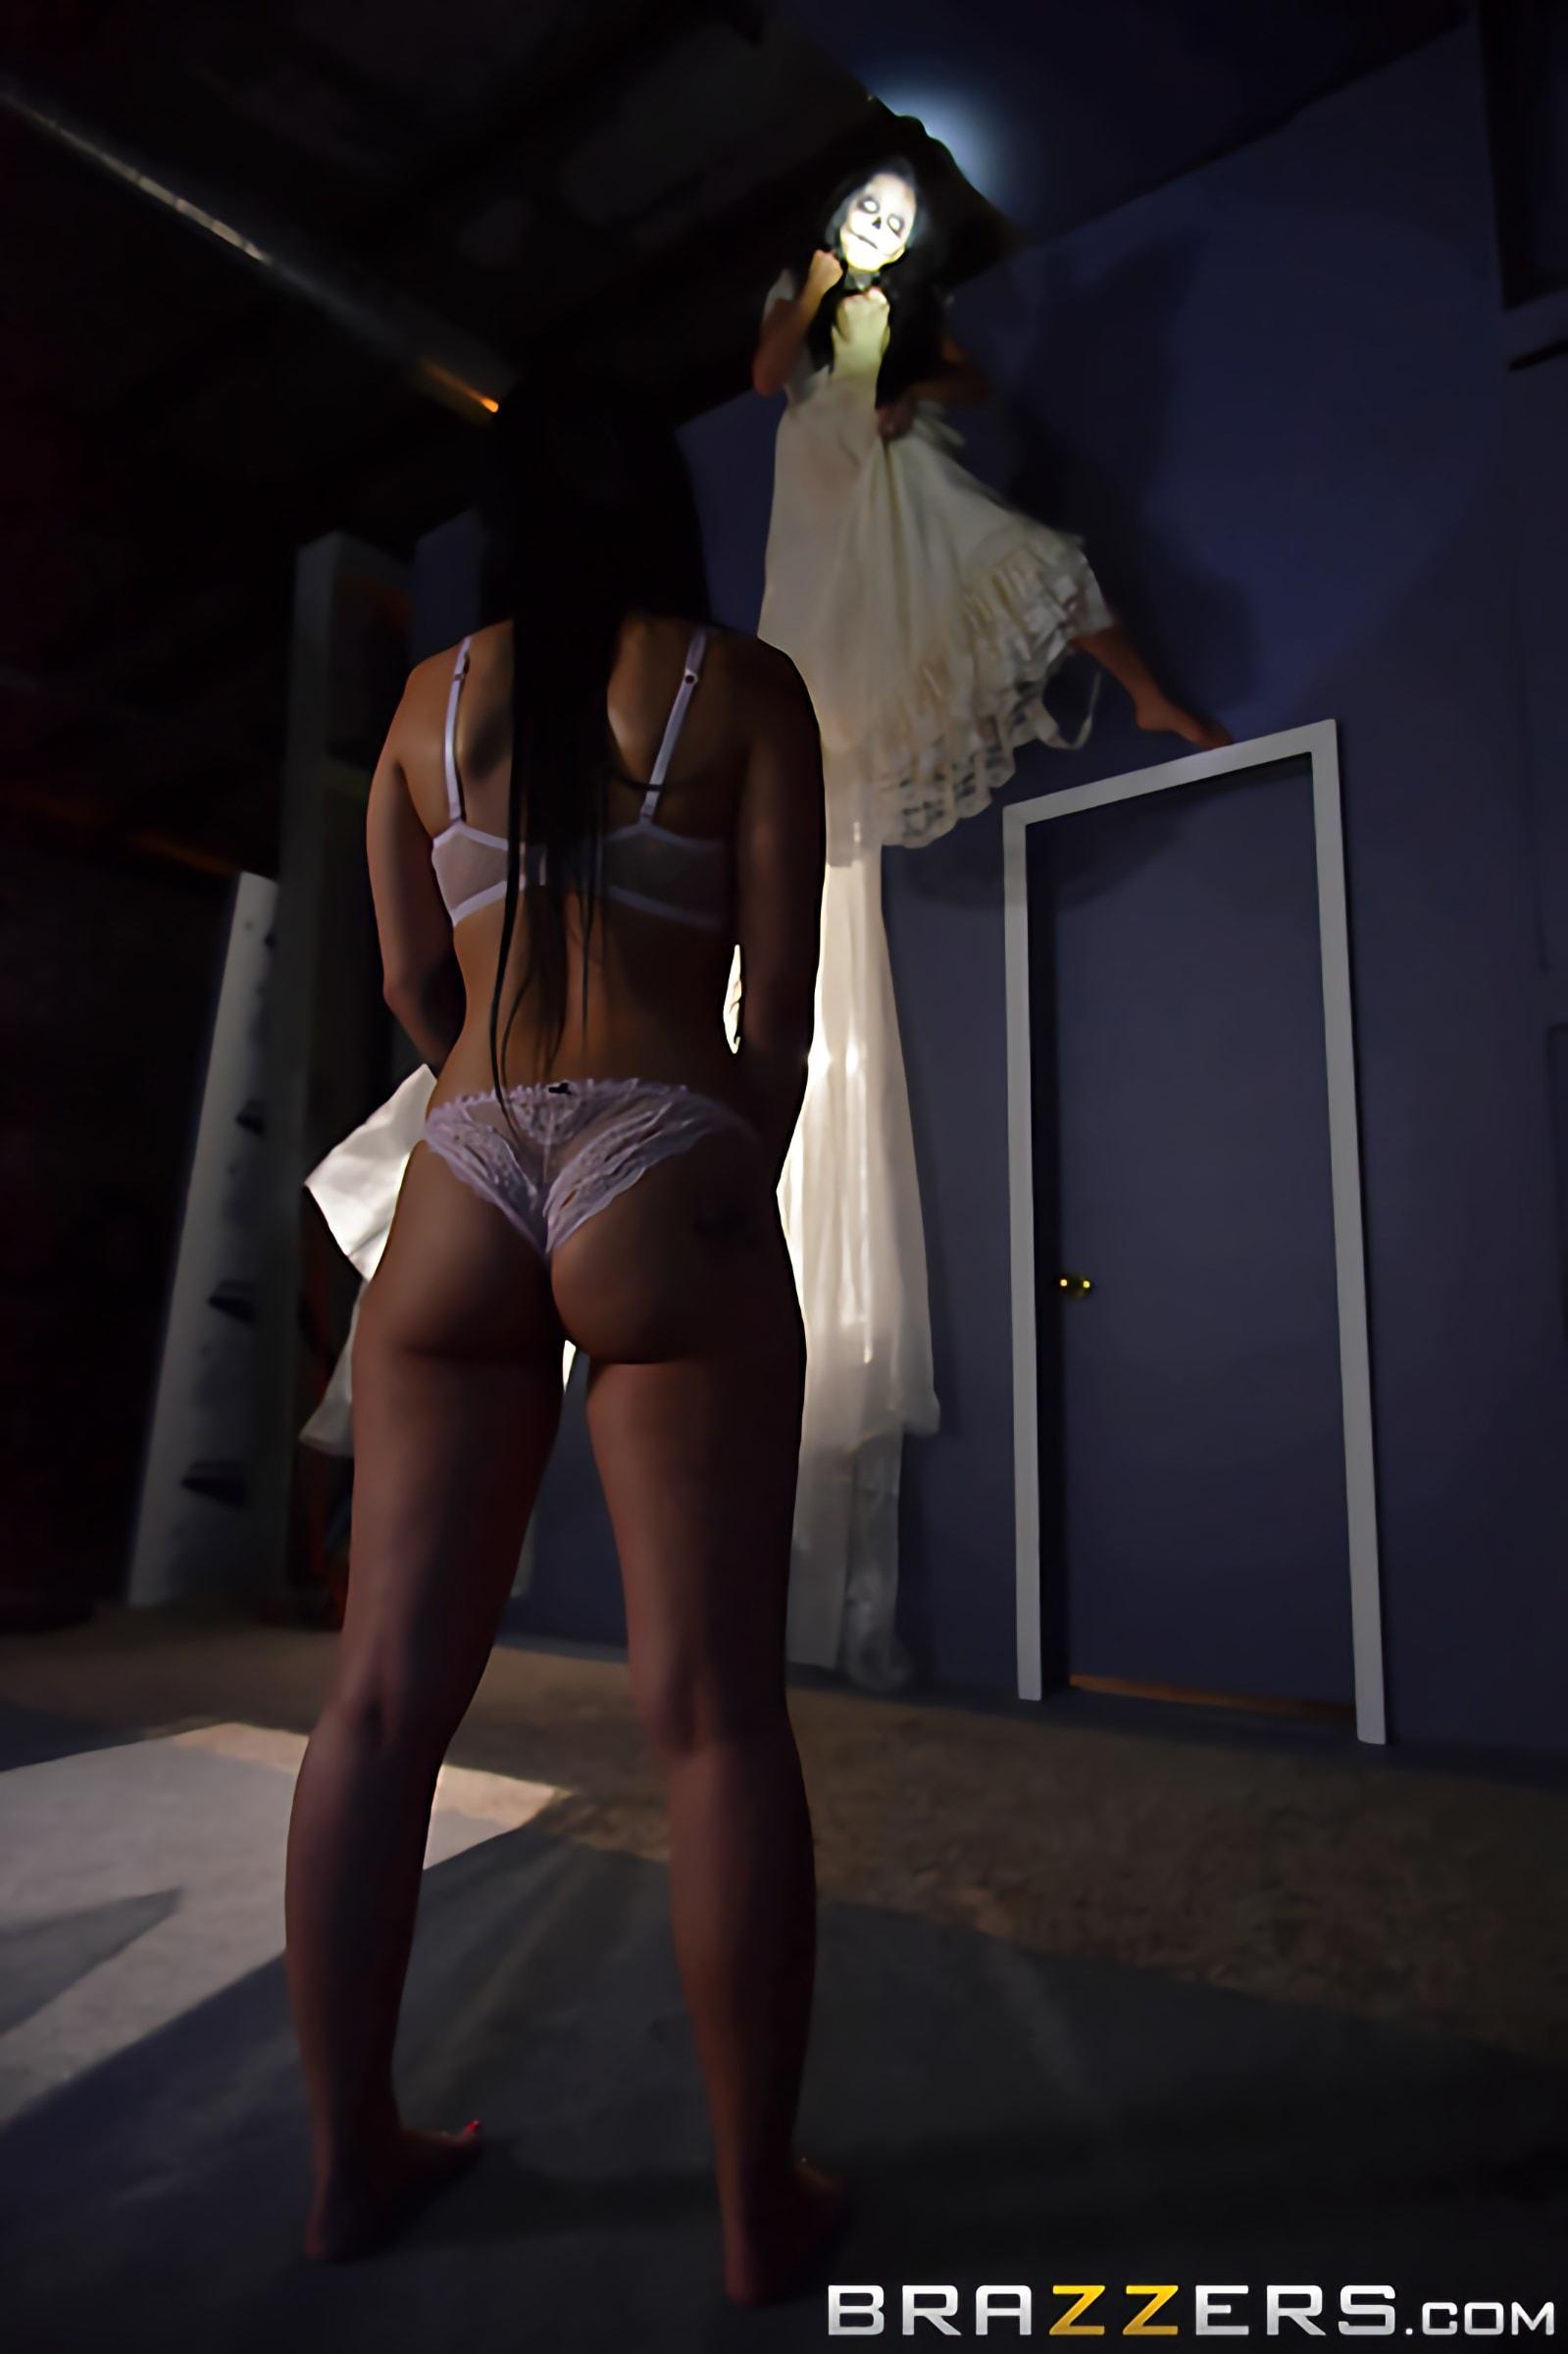 Sex on pornhub